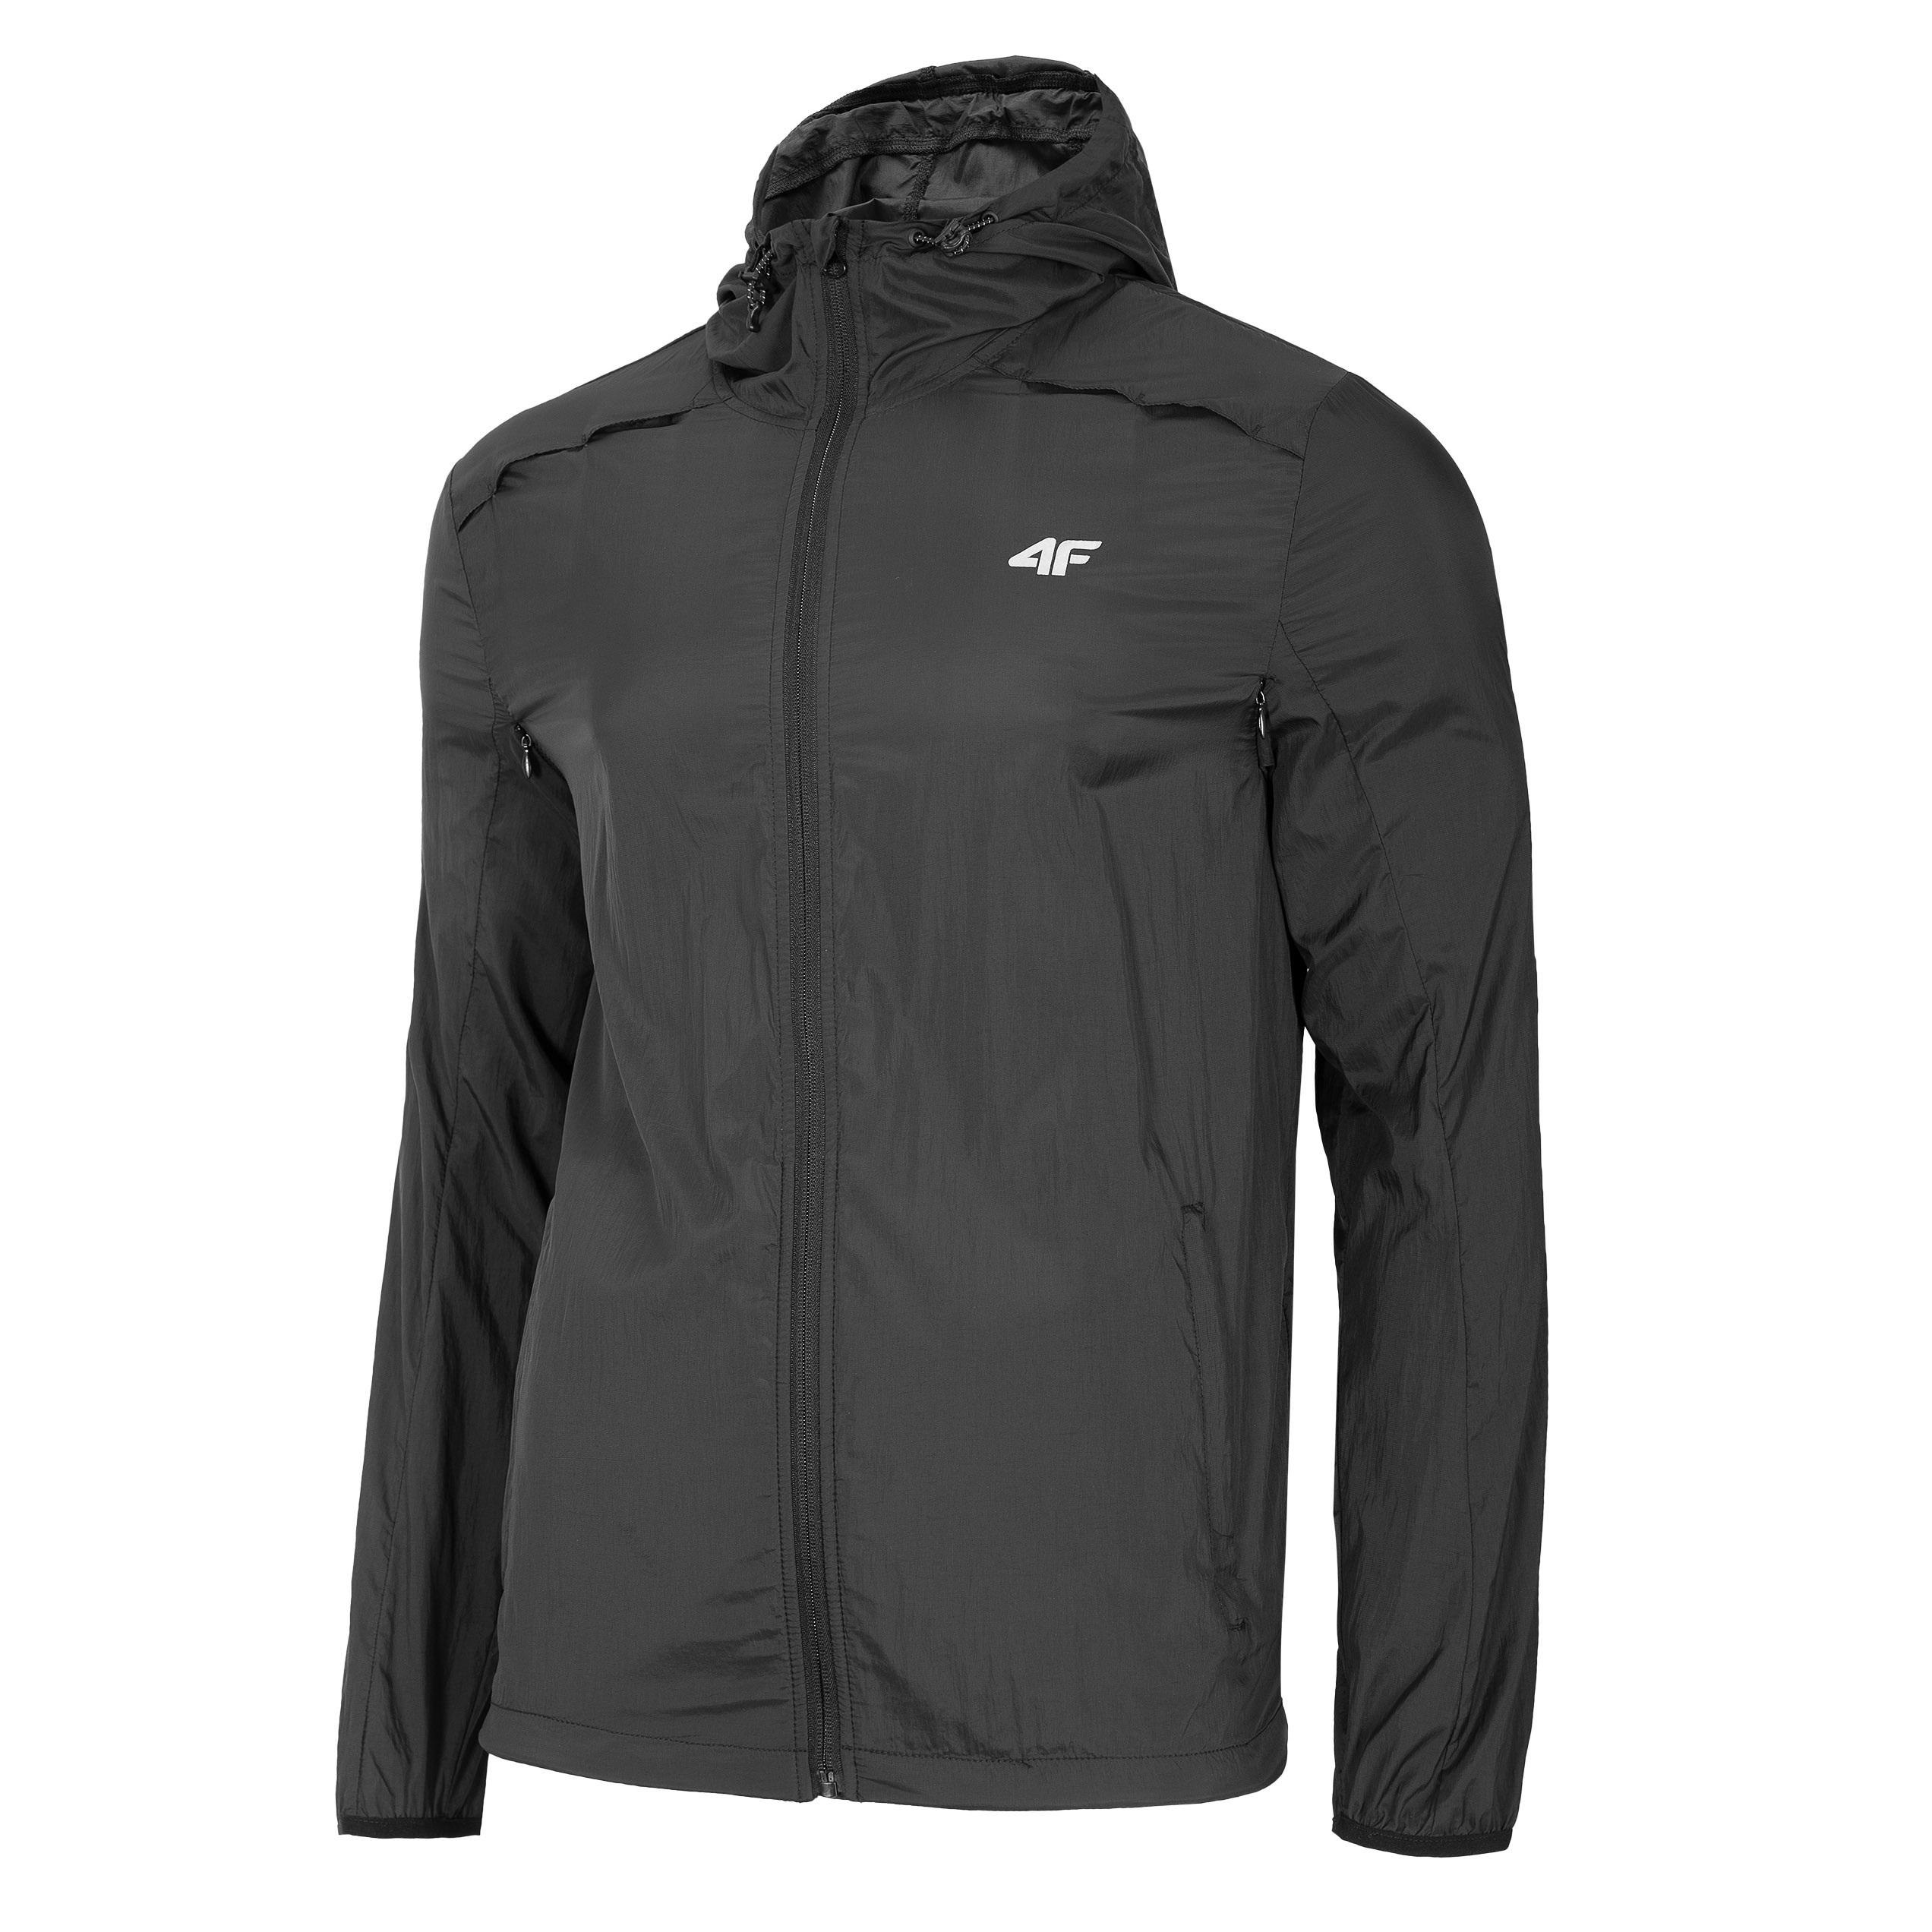 Clothing -  4f Men Functional Jacket KUMTR001